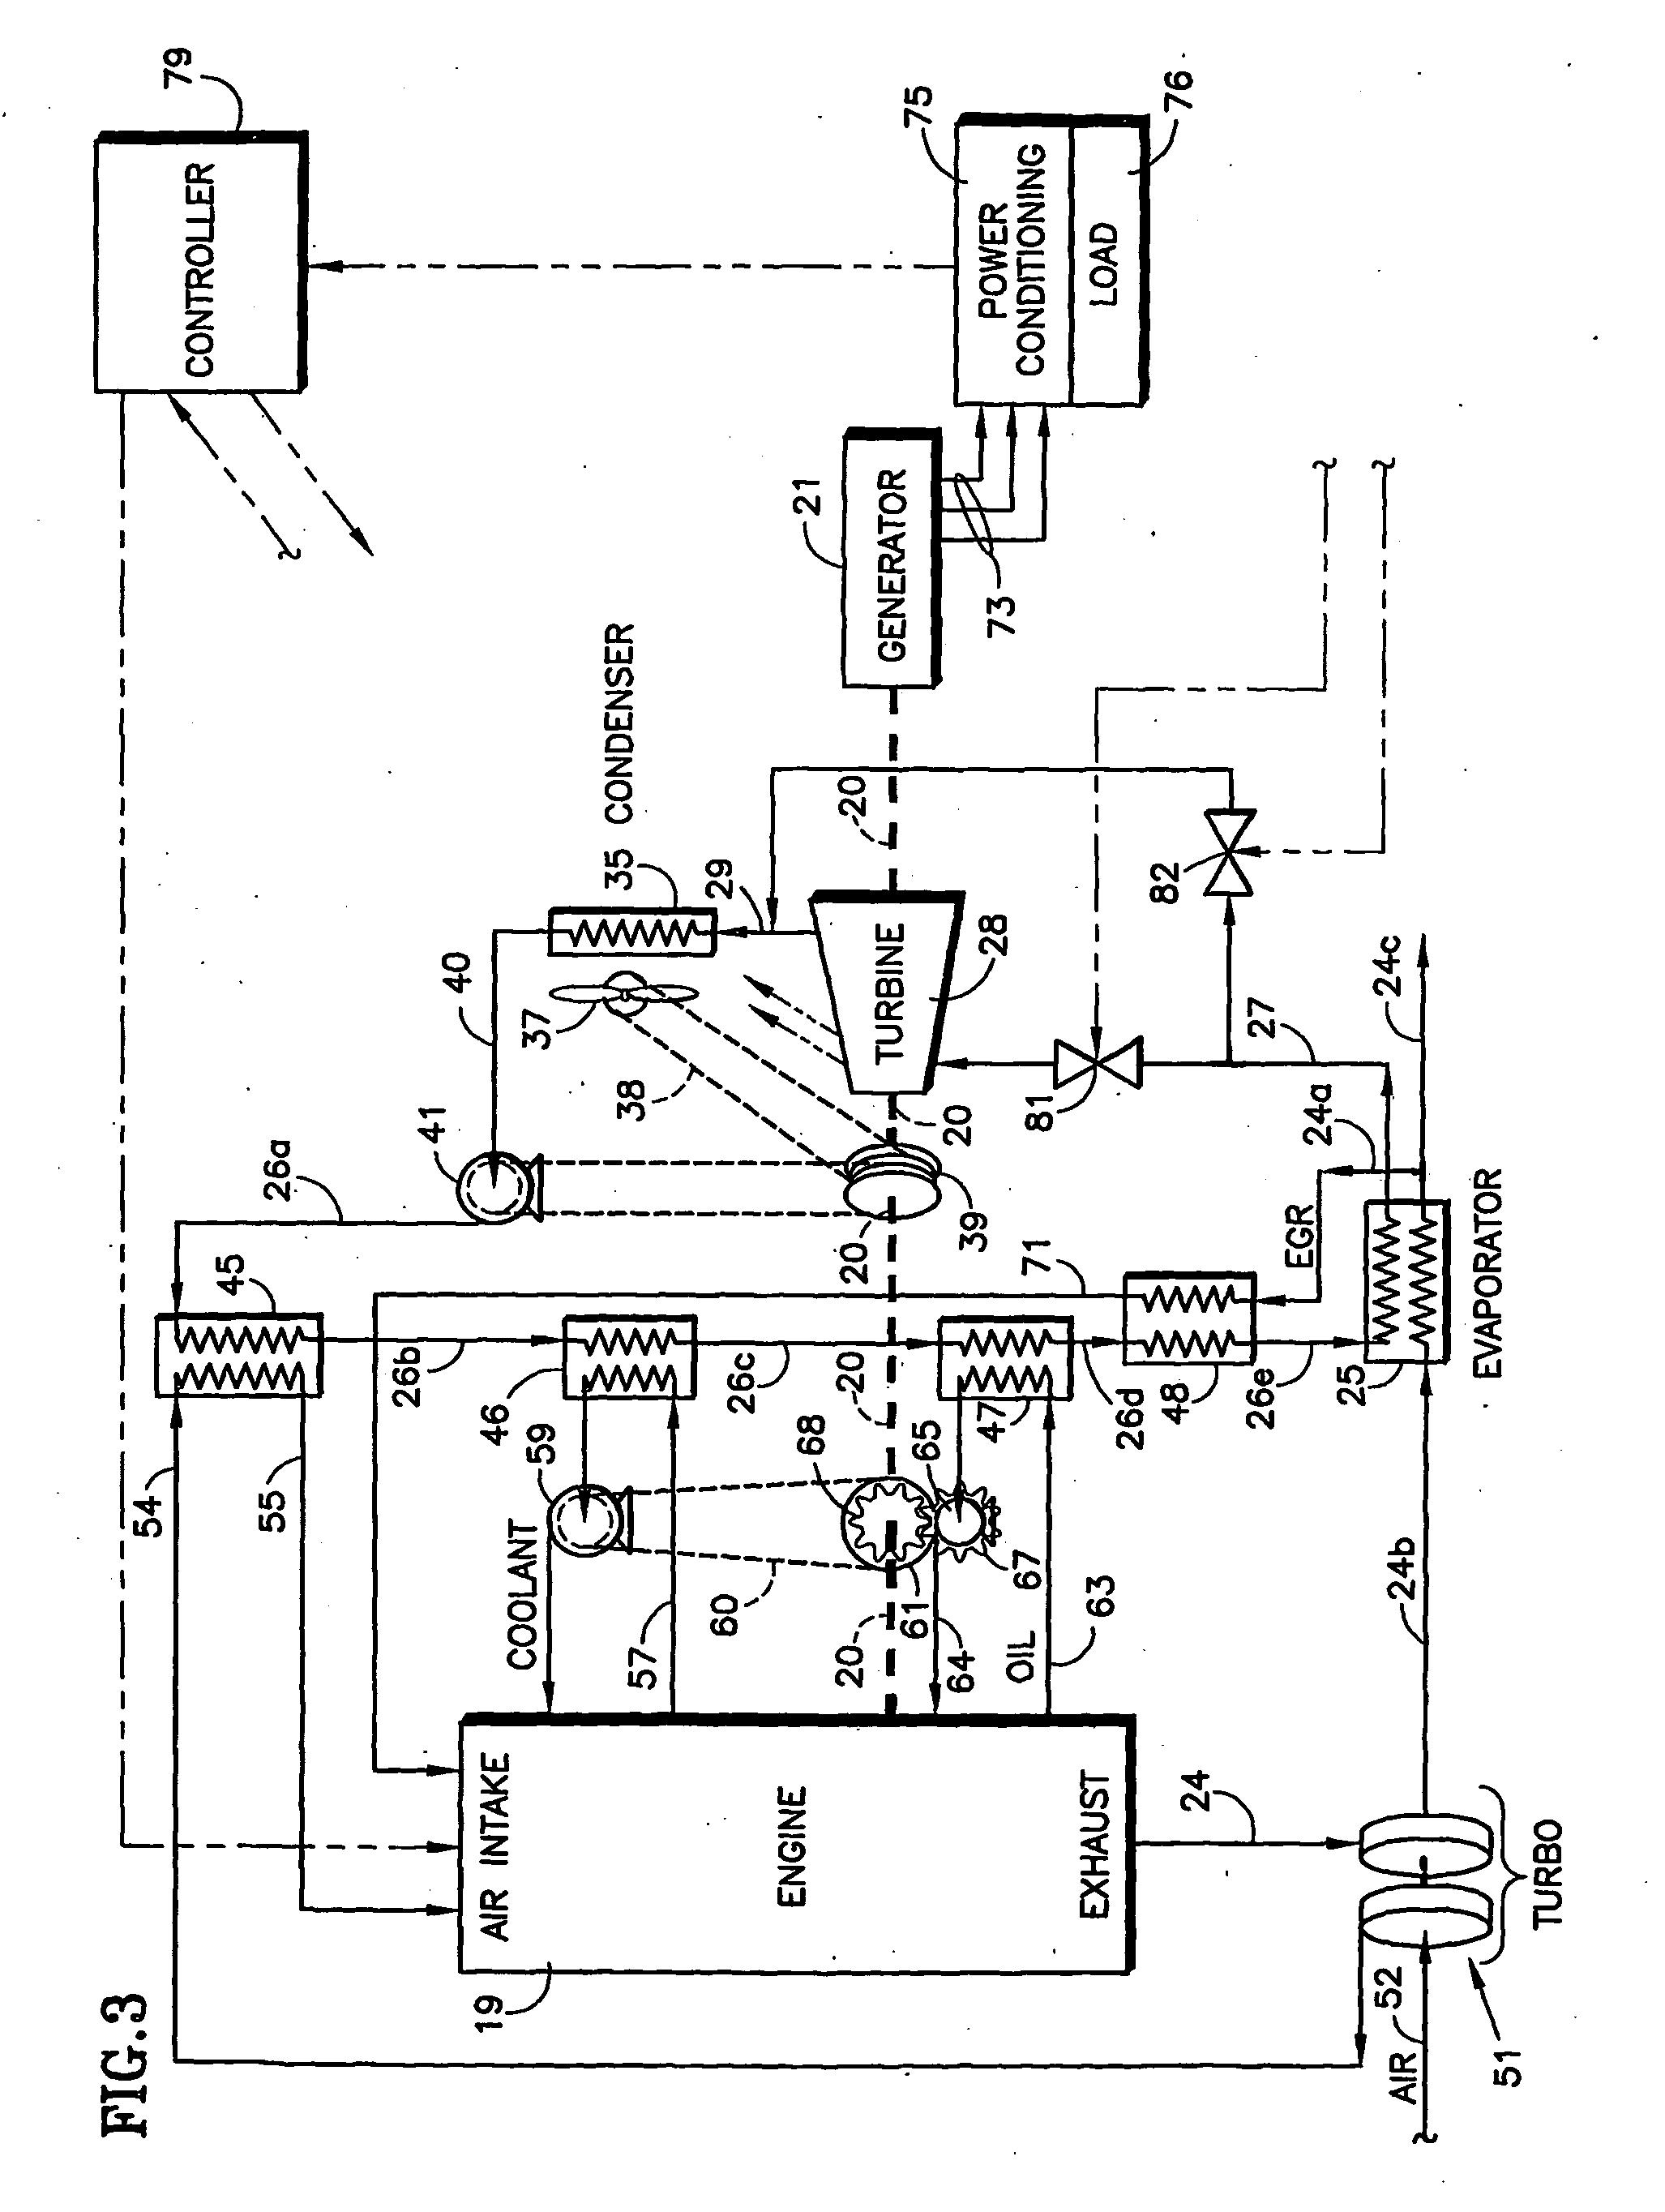 Patent US Organic Rankine Cycle Mechanically and